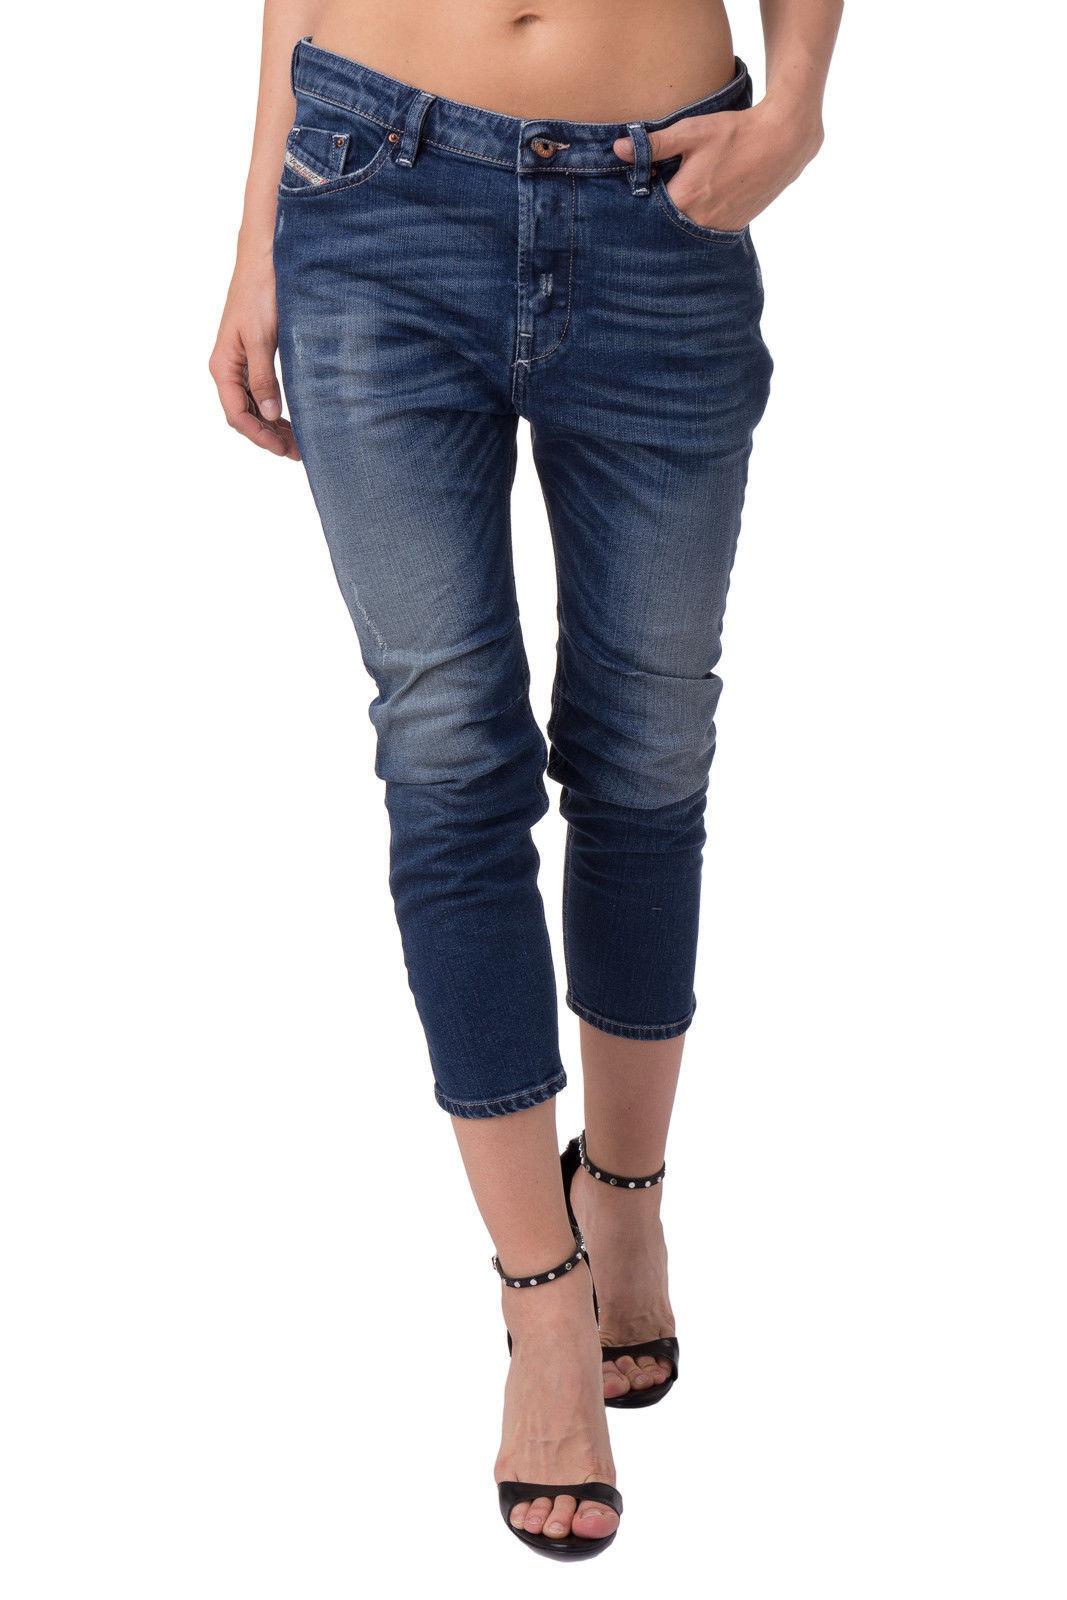 395 Authentic DIESEL Women's Distressed Faded Relaxed Boyfriend Eazee-R Jeans